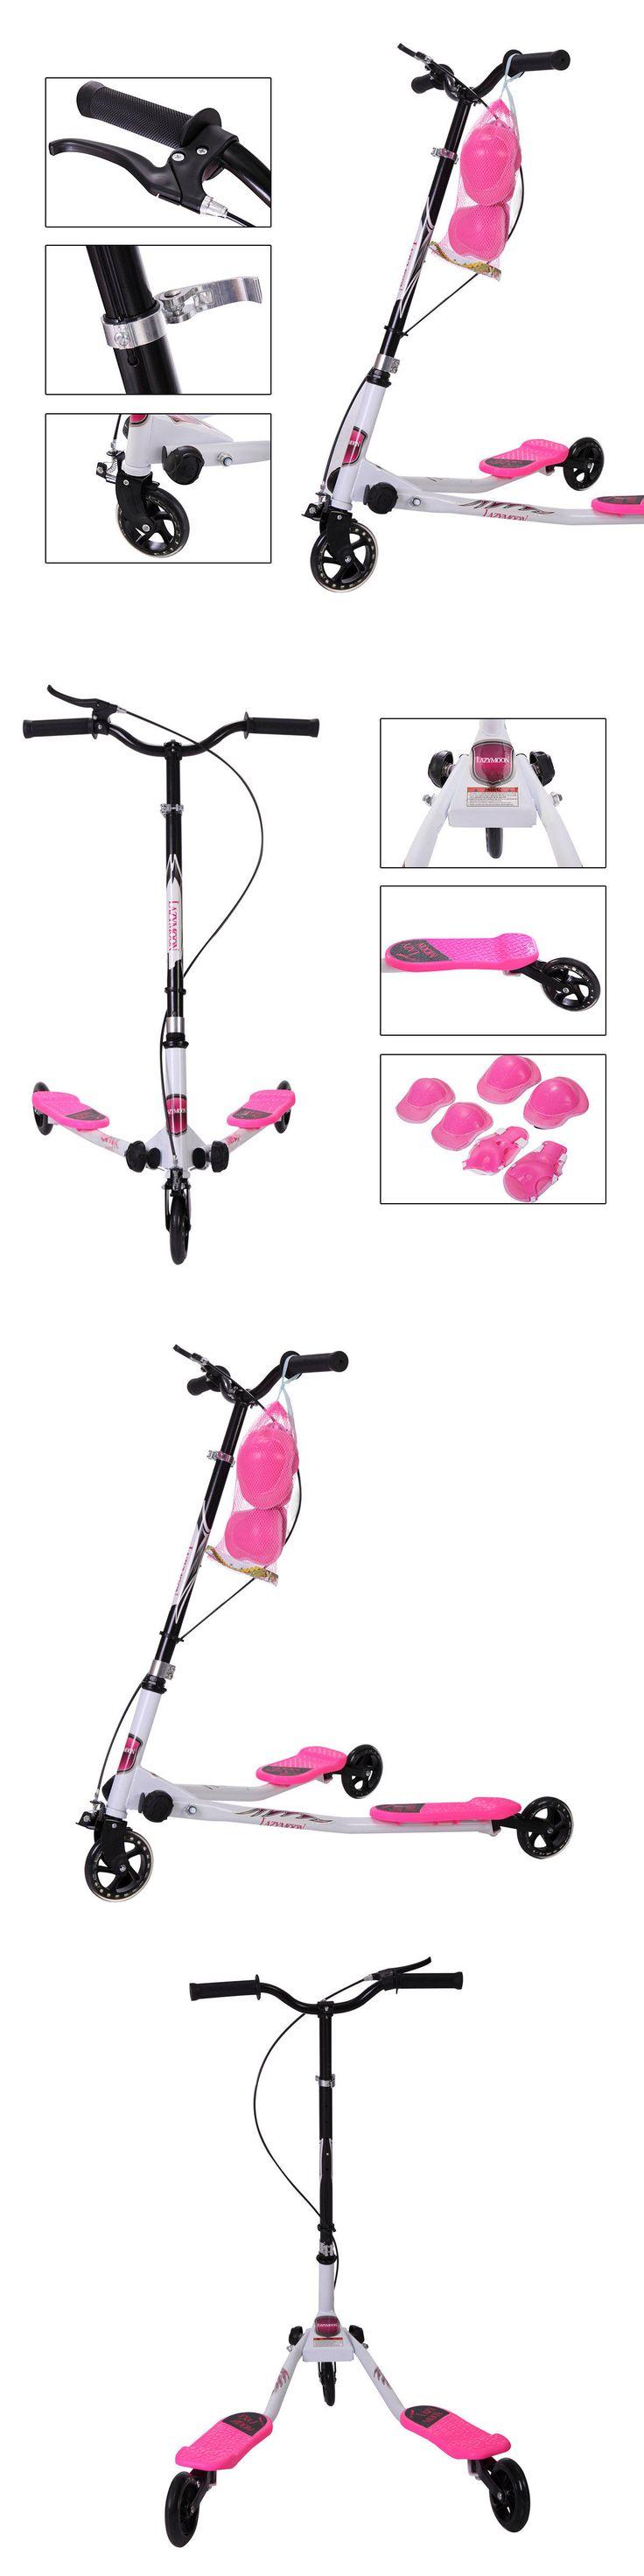 Kick Scooters 11331: Pink Kids Scooter Wiggle Y Flicker Foldable Speeder Tri Slider Kickboard Medium -> BUY IT NOW ONLY: $53.99 on eBay!